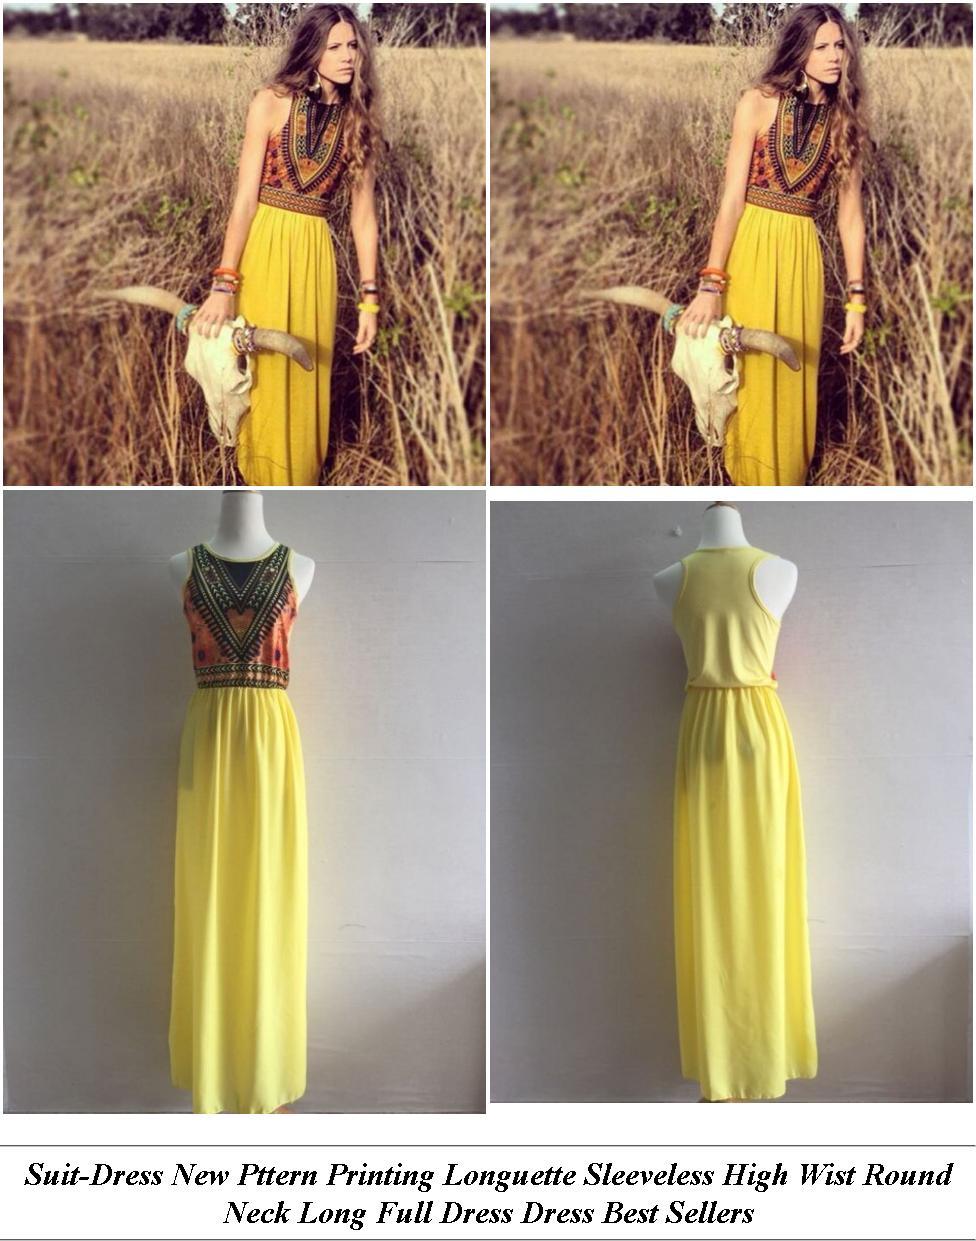 Urgundy Long Sleeve Dress Plus Size - Sale Canada Goose Coats - Womens Lack Dresses Zara